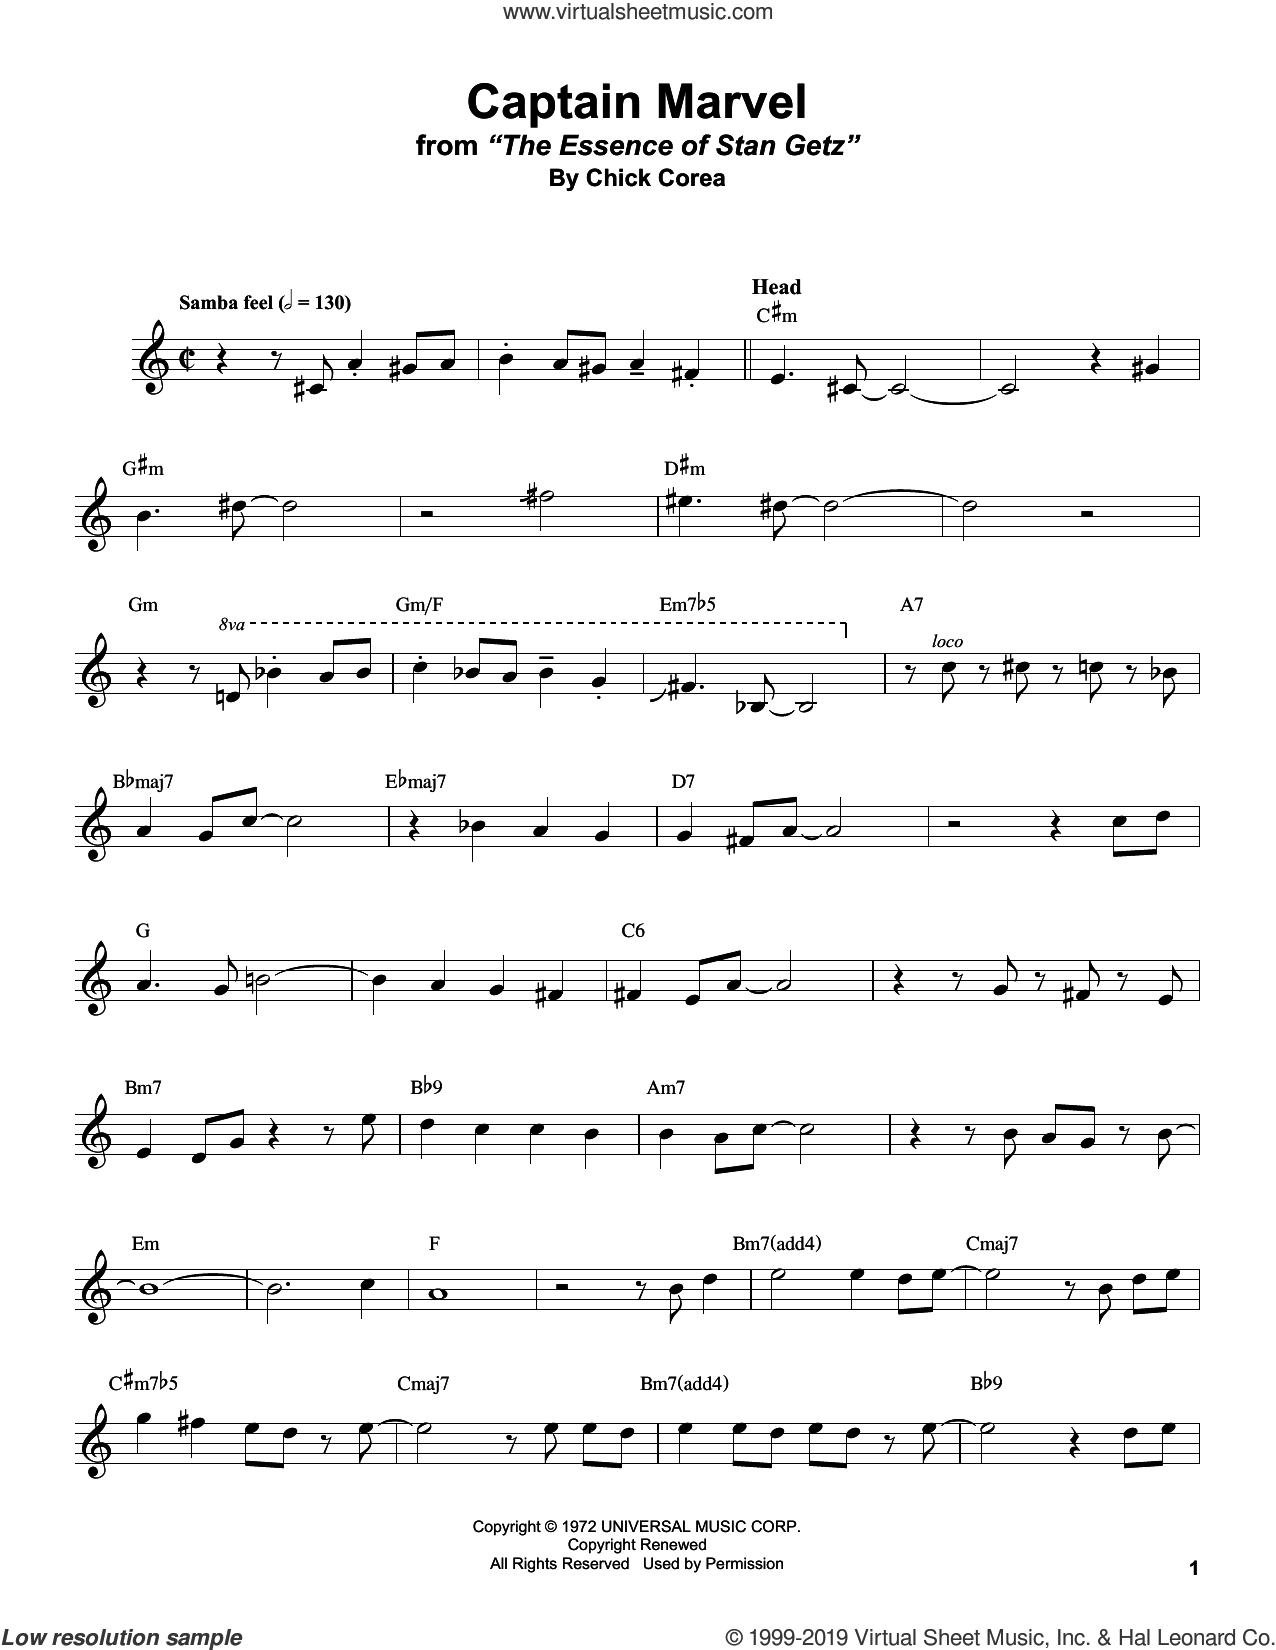 Captain Marvel sheet music for alto saxophone (transcription) by Stan Getz and Chick Corea, intermediate skill level